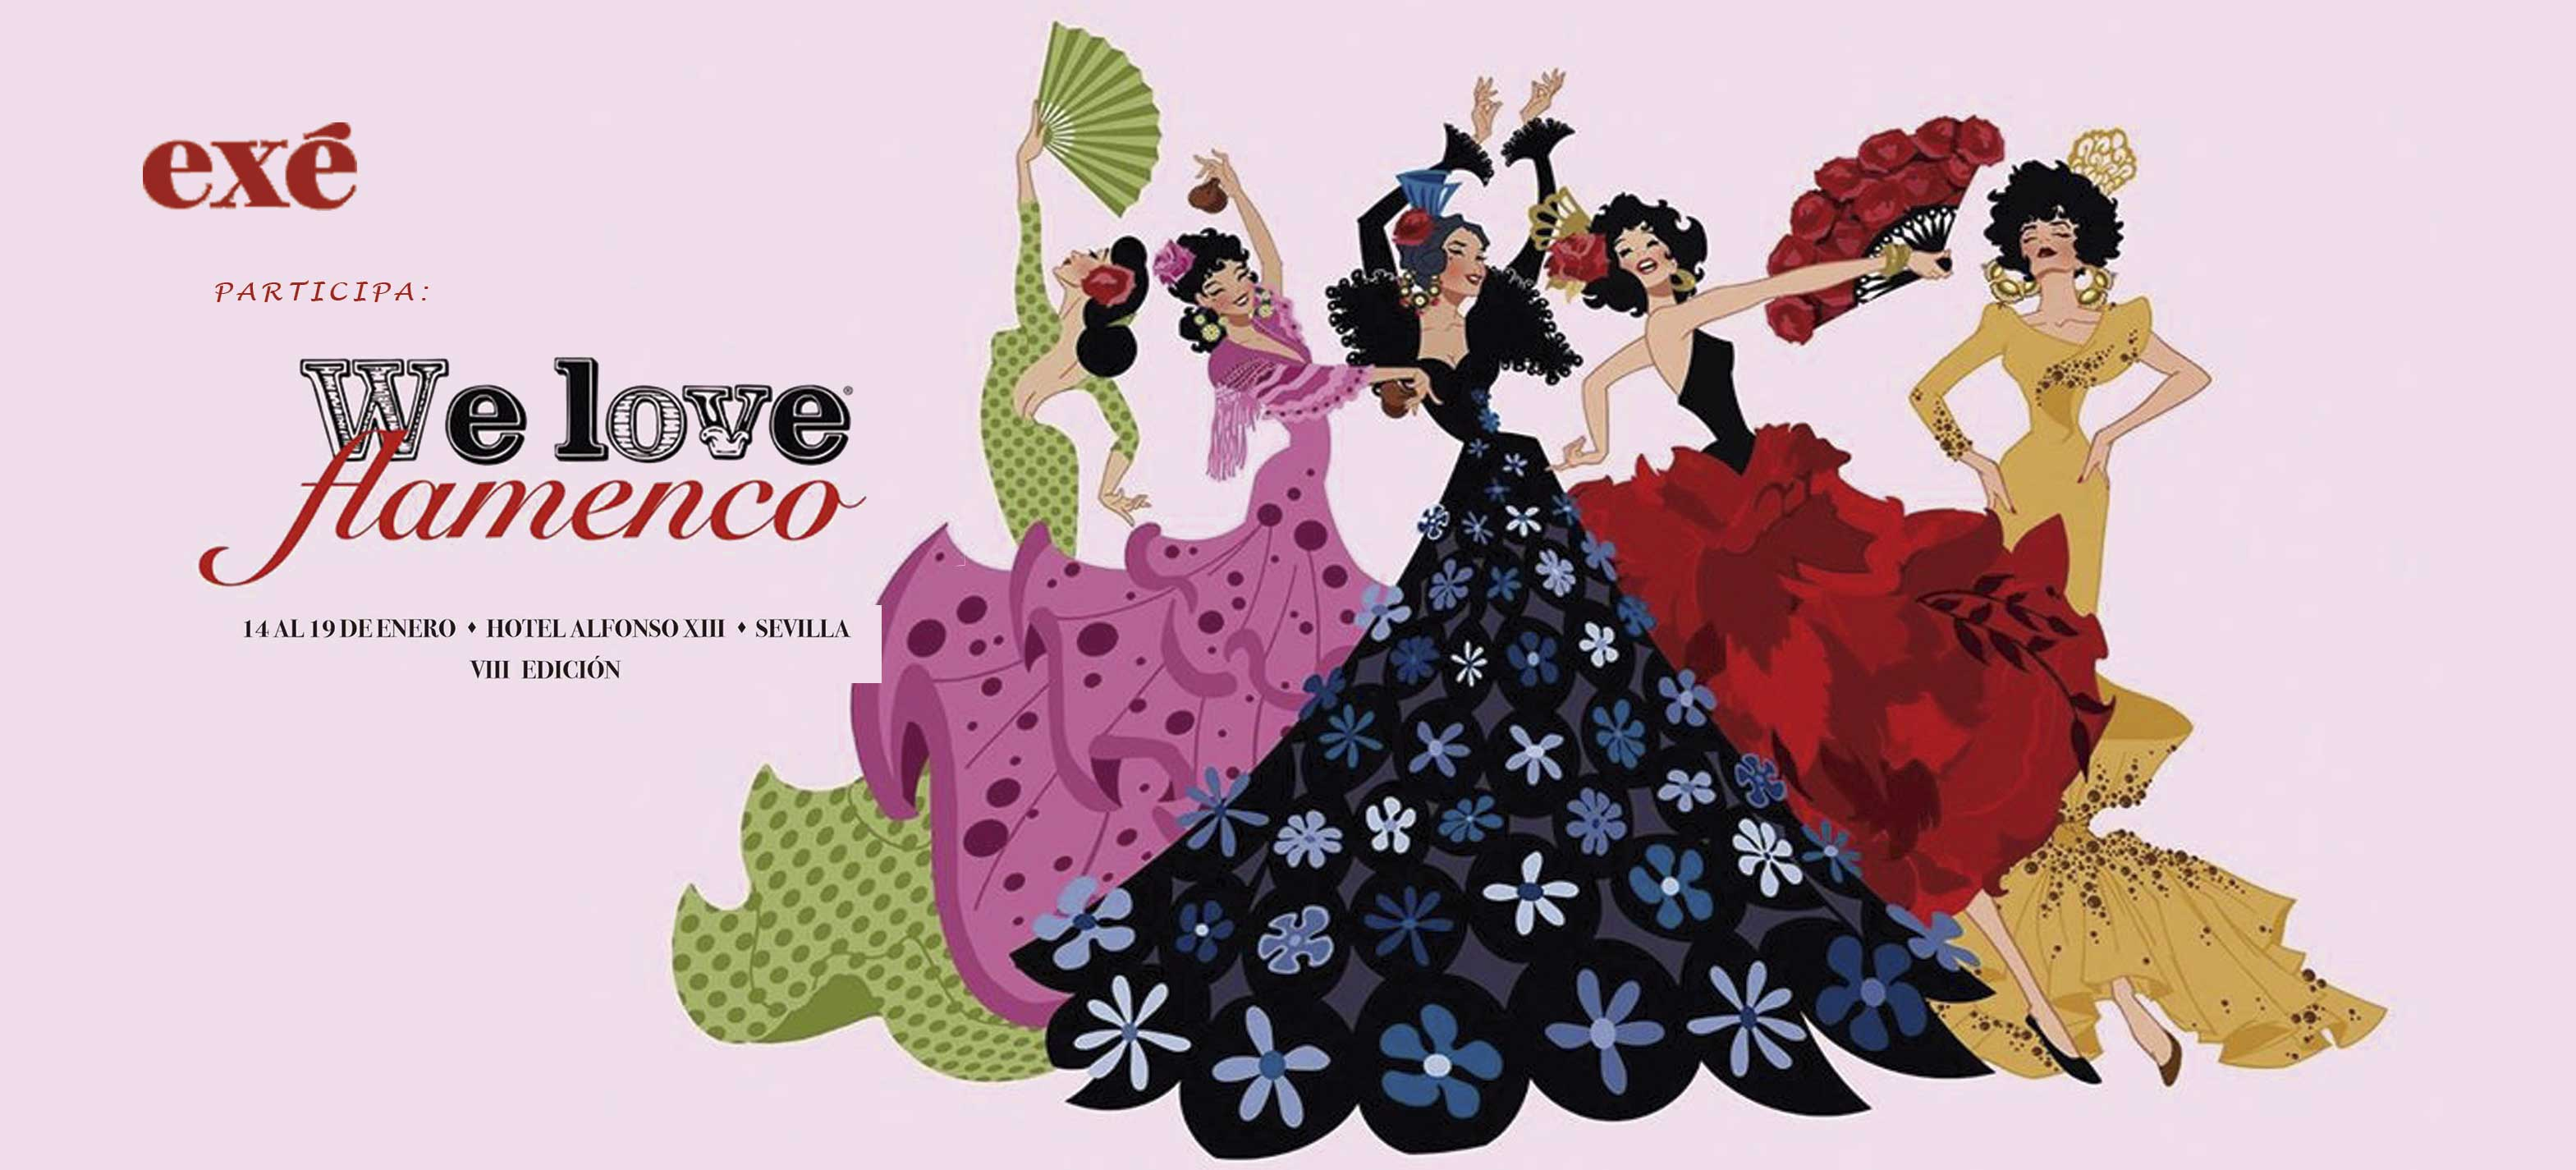 Exé Shoes, en la pasarela de moda flamenca We Love Flamenco